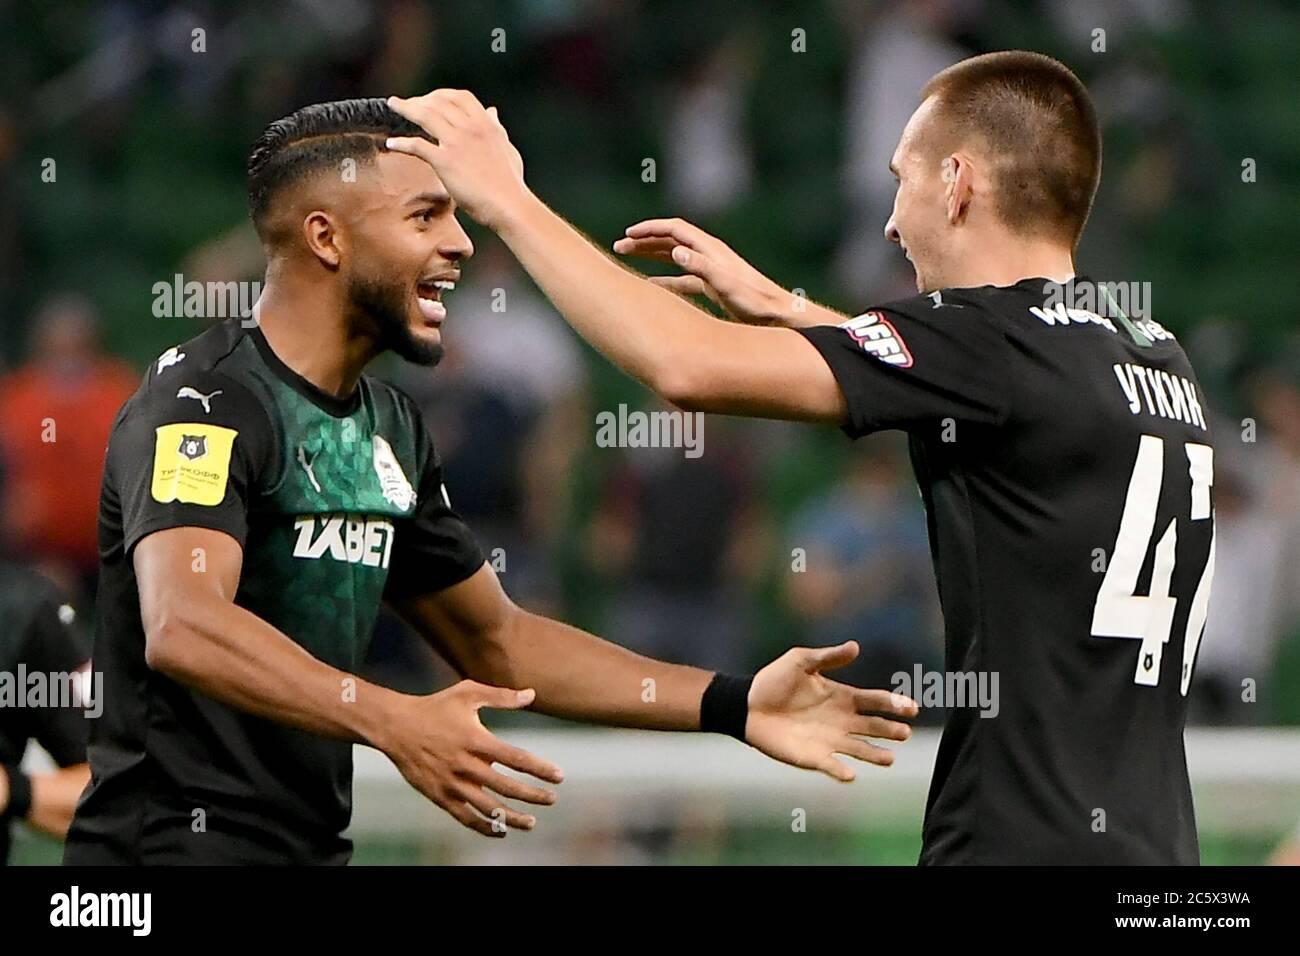 Krasnodar Russia 5th July 2020 Fc Krasnodar S Wanderson L And Daniil Utkin Celebrate A Goal In